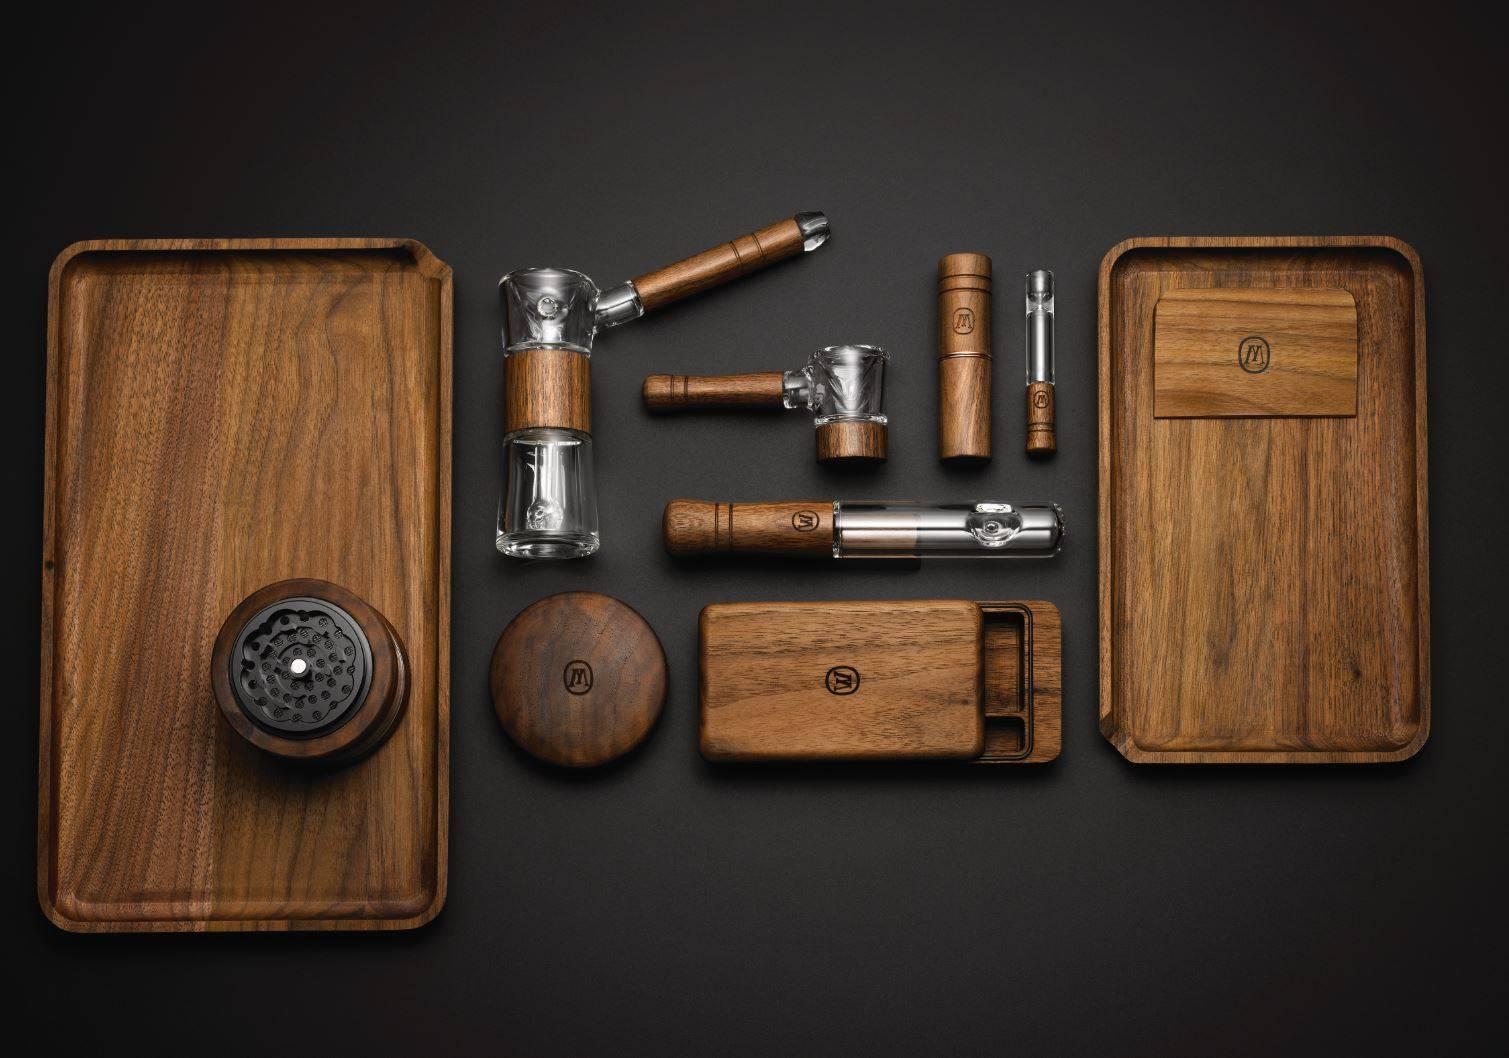 Stylish Marley Natural Walnut Wood & Borosilicate Glass Hand Pipes - DopeBoo